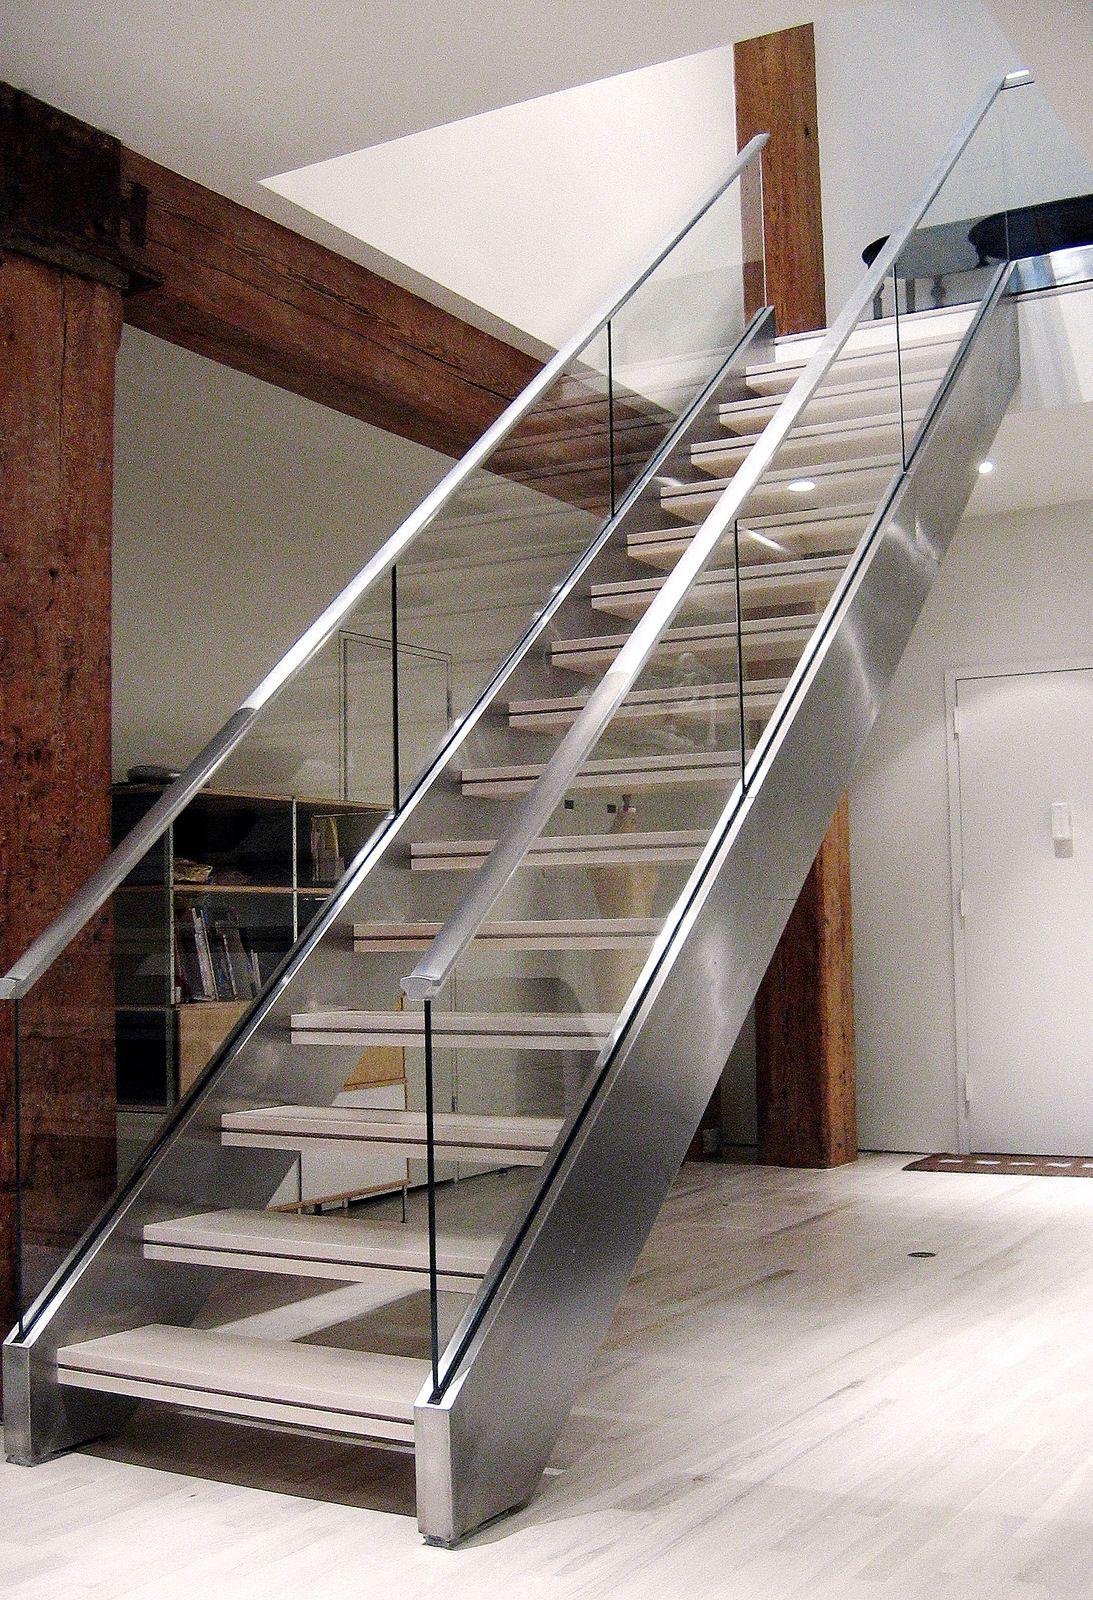 Best Lanier Stair Caliper Studio Glass Railing Steel 400 x 300